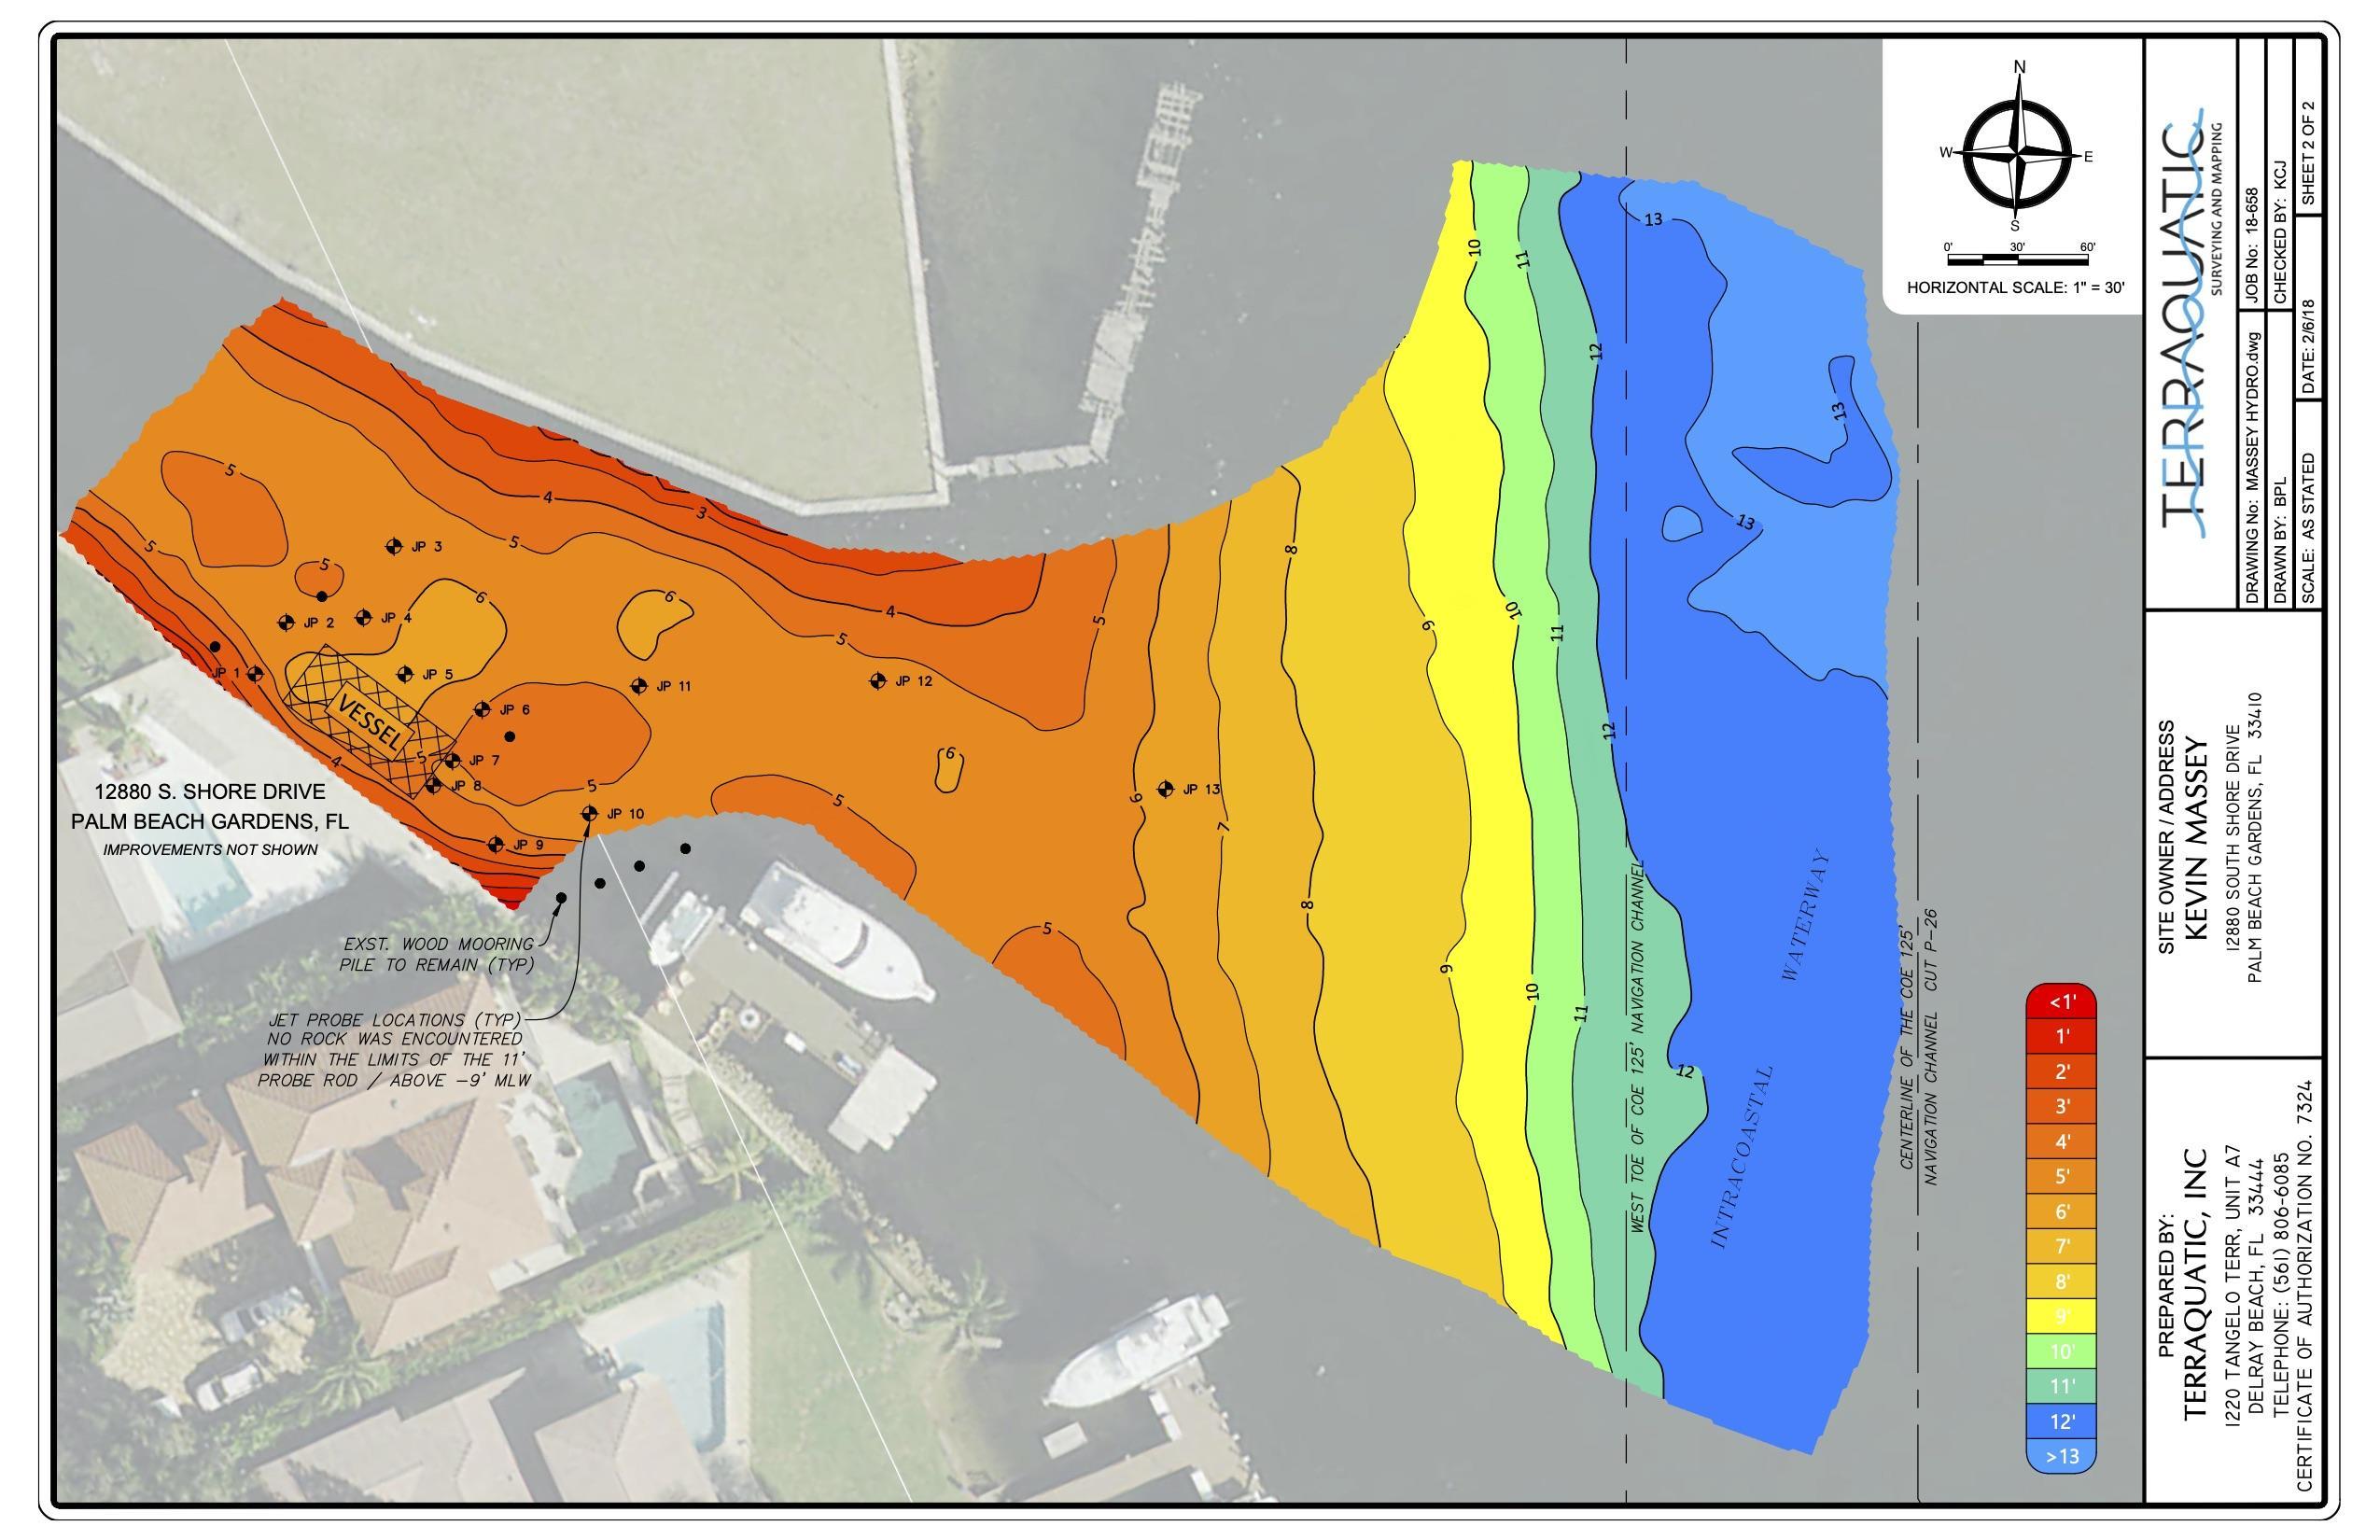 Hydro Survey page 2